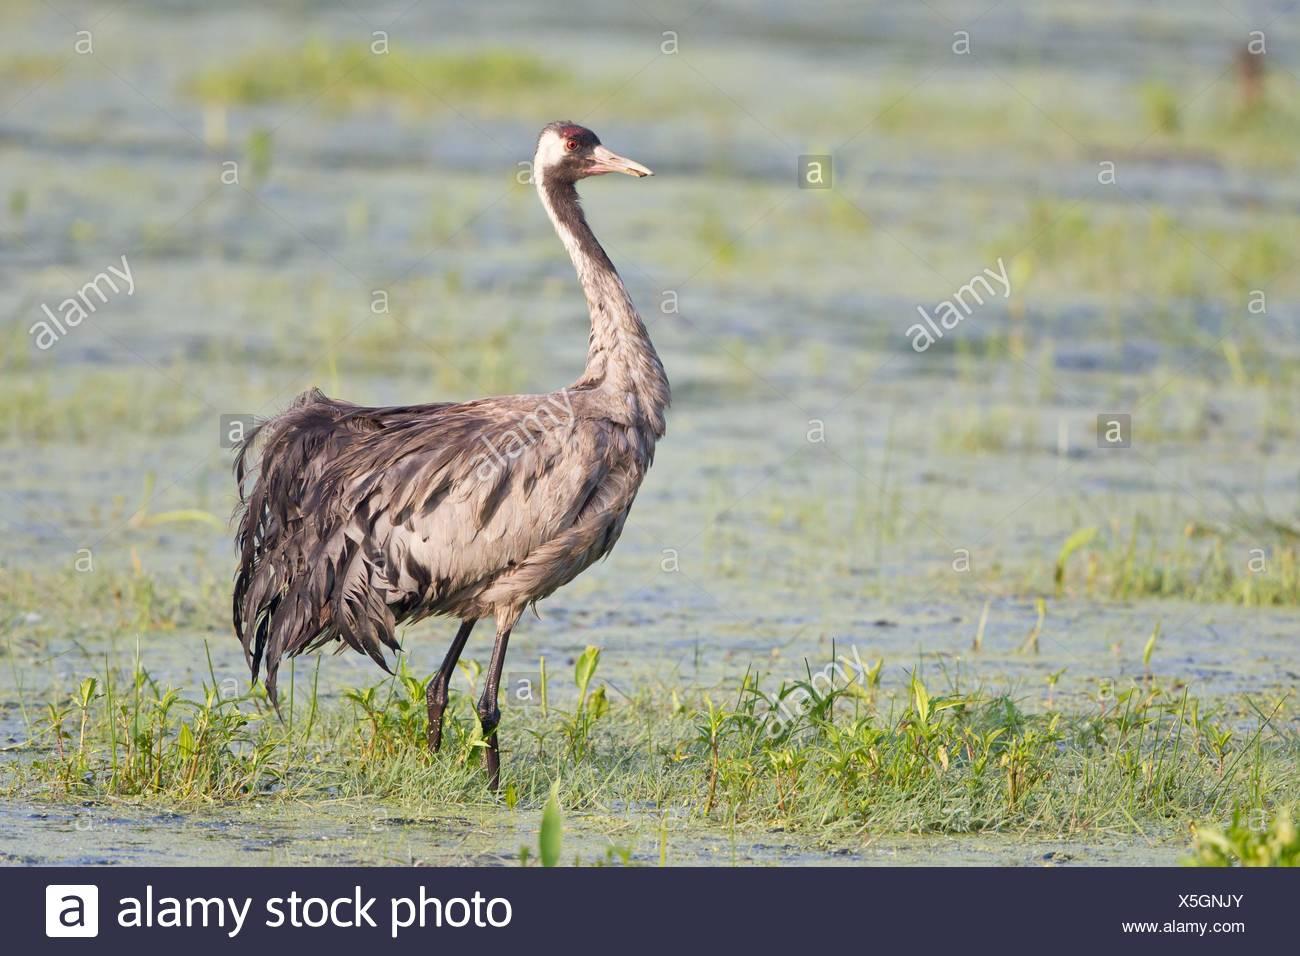 feathers, feathering, crane, feathers, feathering, crane, grayer, grey, gray, Stock Photo